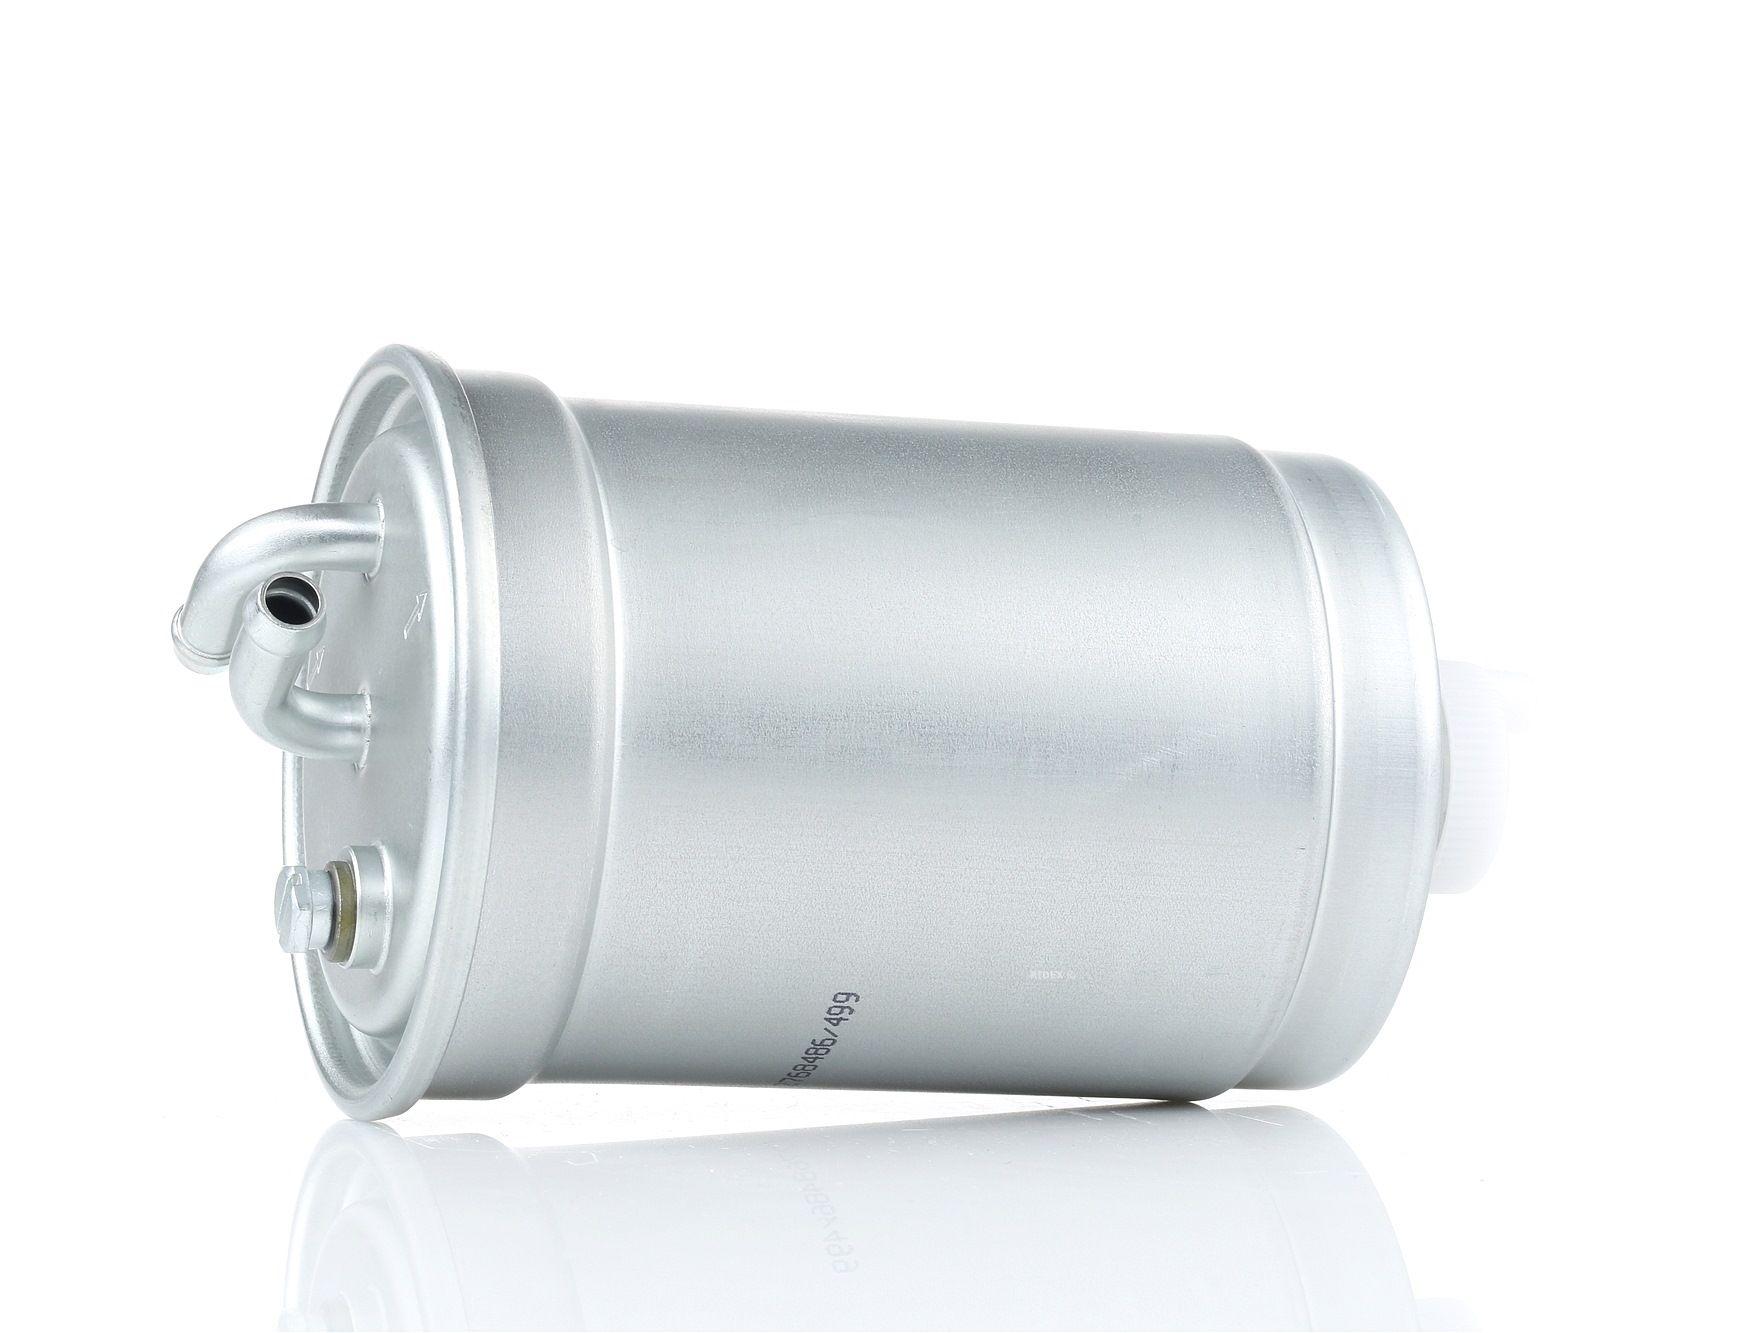 ROVER STREETWISE 2005 Spritfilter - Original RIDEX 9F0128 Höhe: 168,5mm